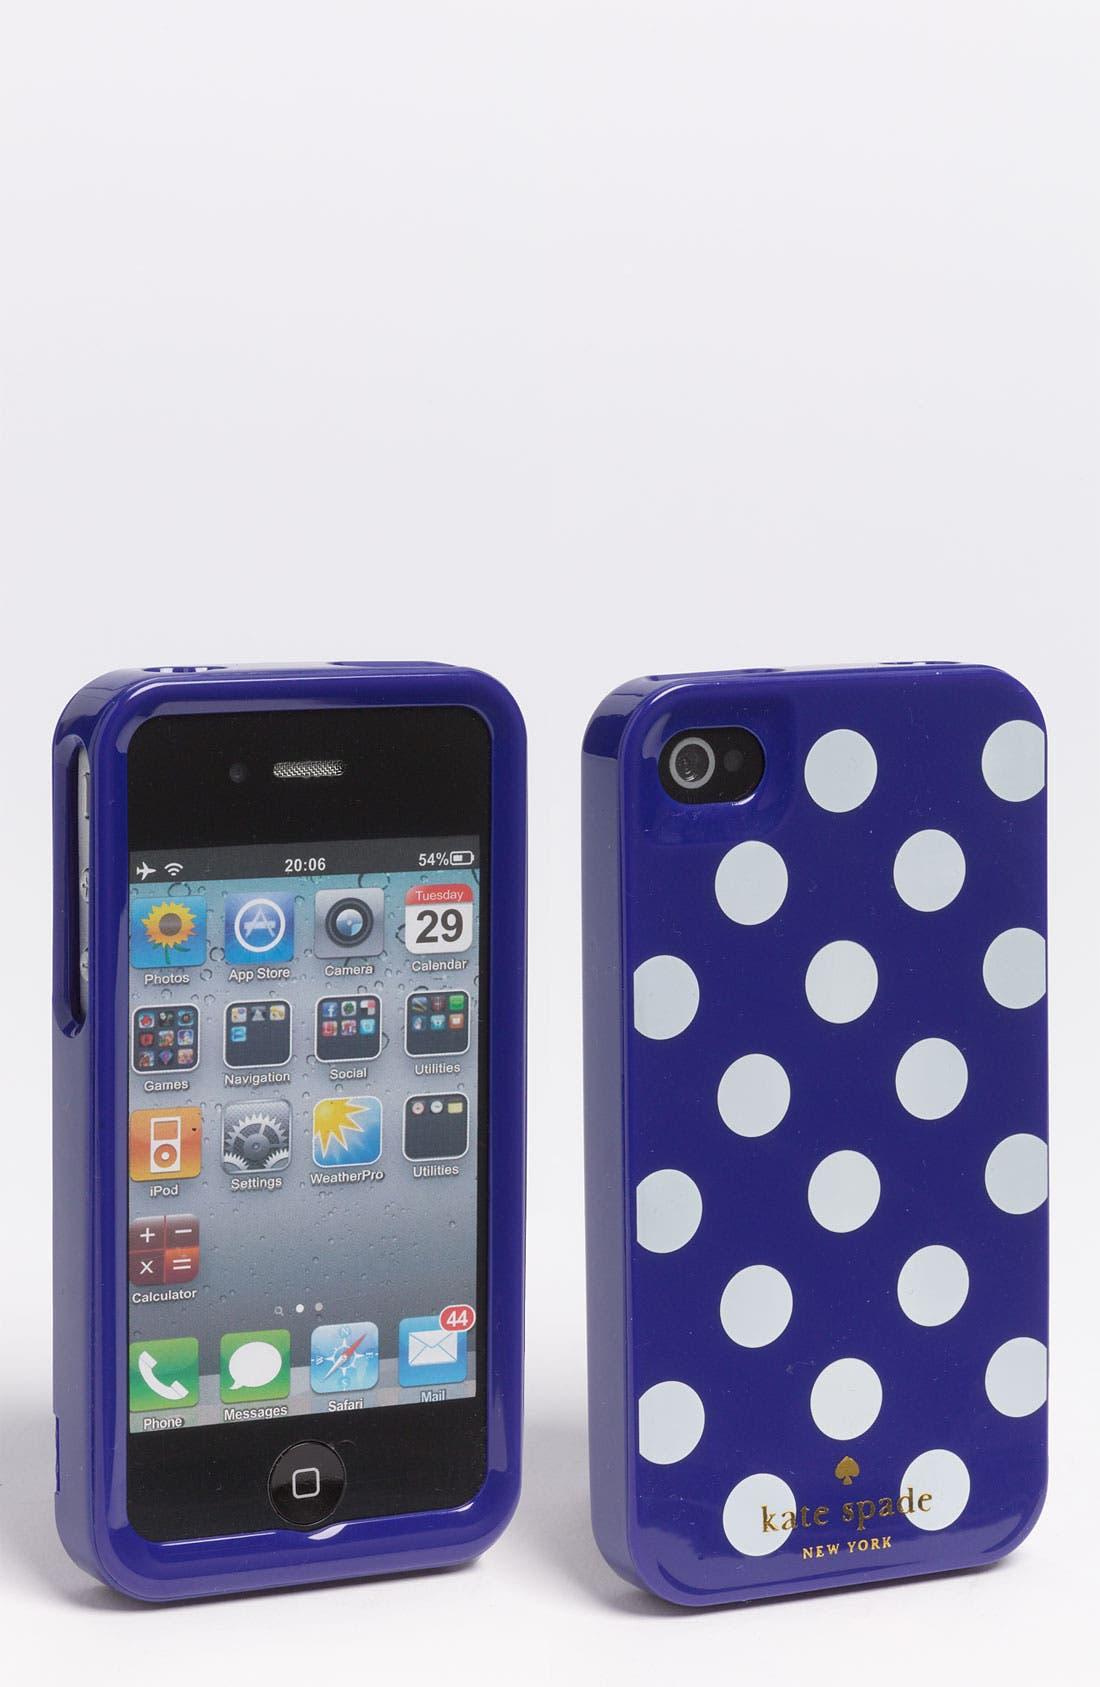 Alternate Image 1 Selected - kate spade new york 'la pavillion' iPhone 4 & 4S case